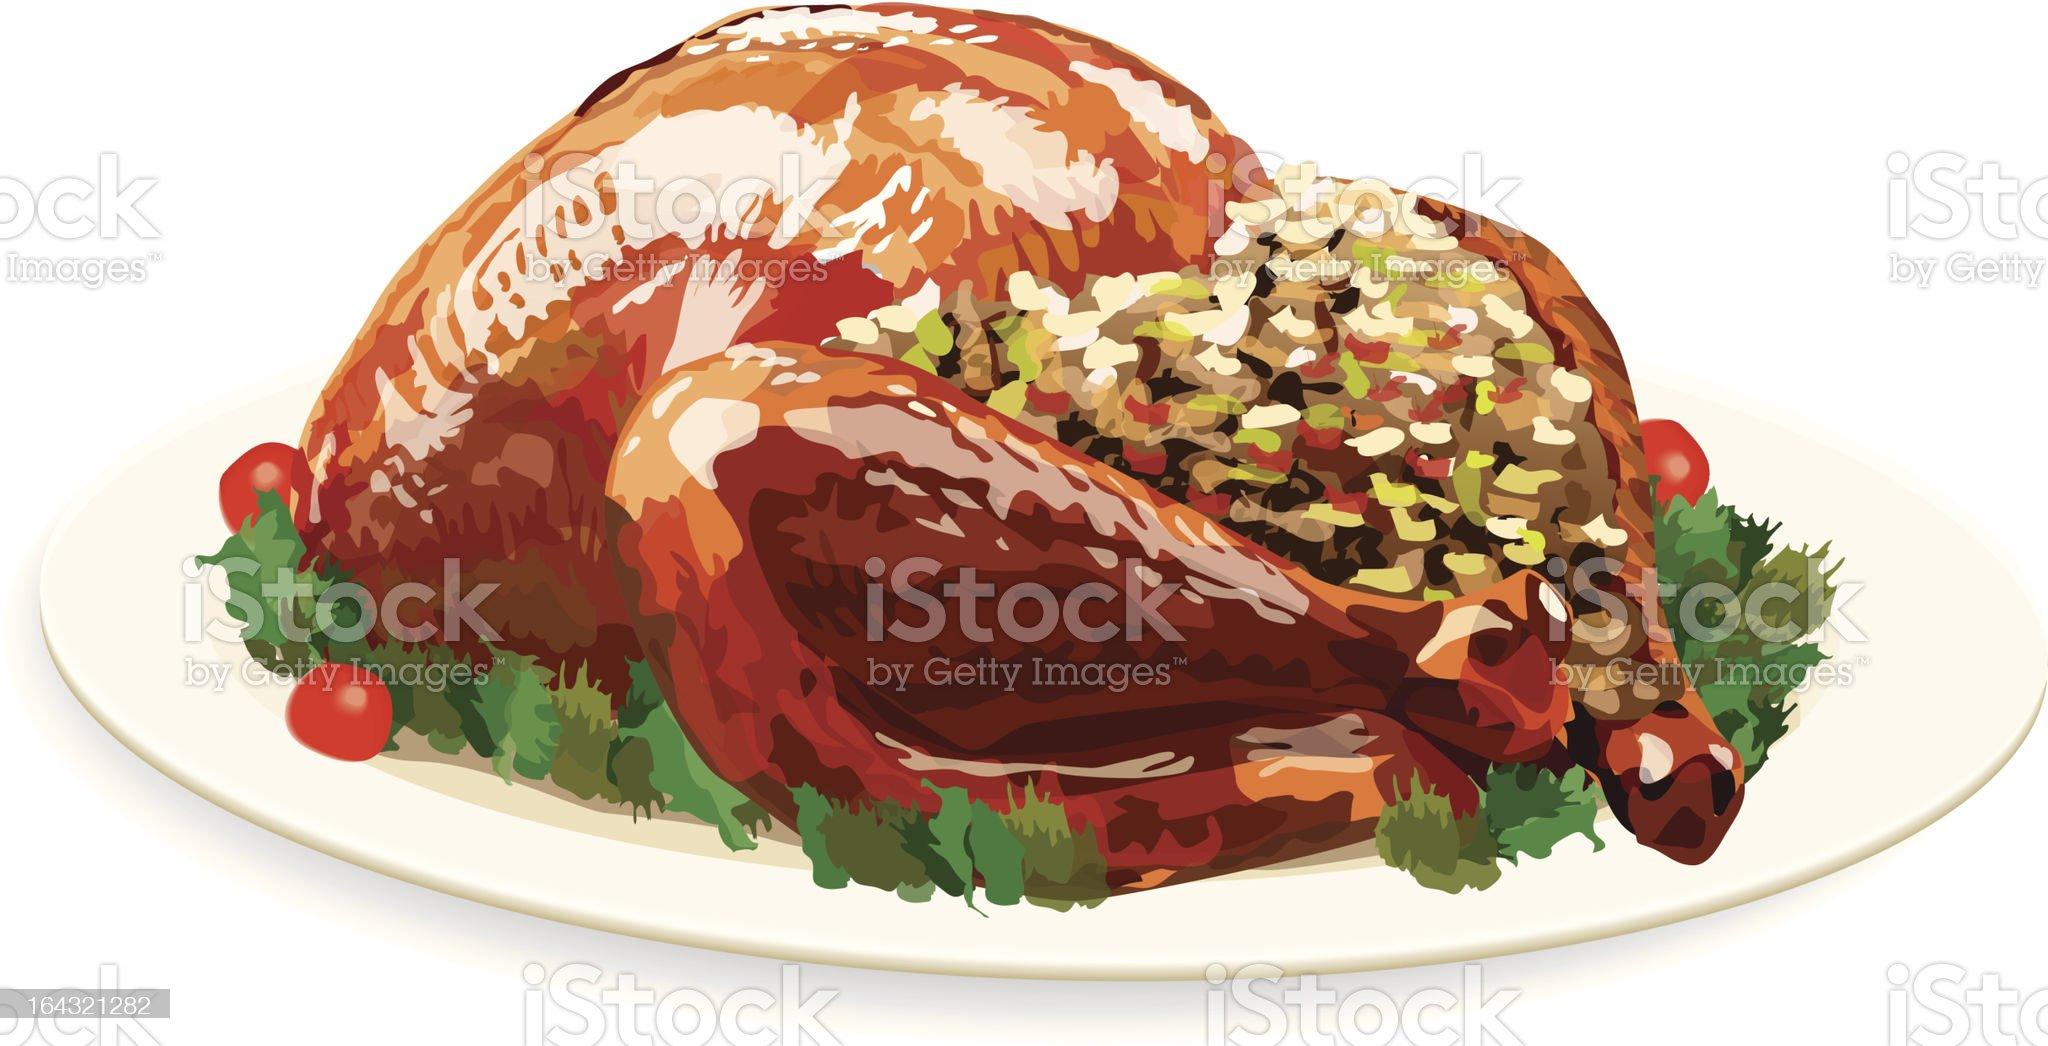 Turkey Dinner on a Platter royalty-free stock vector art